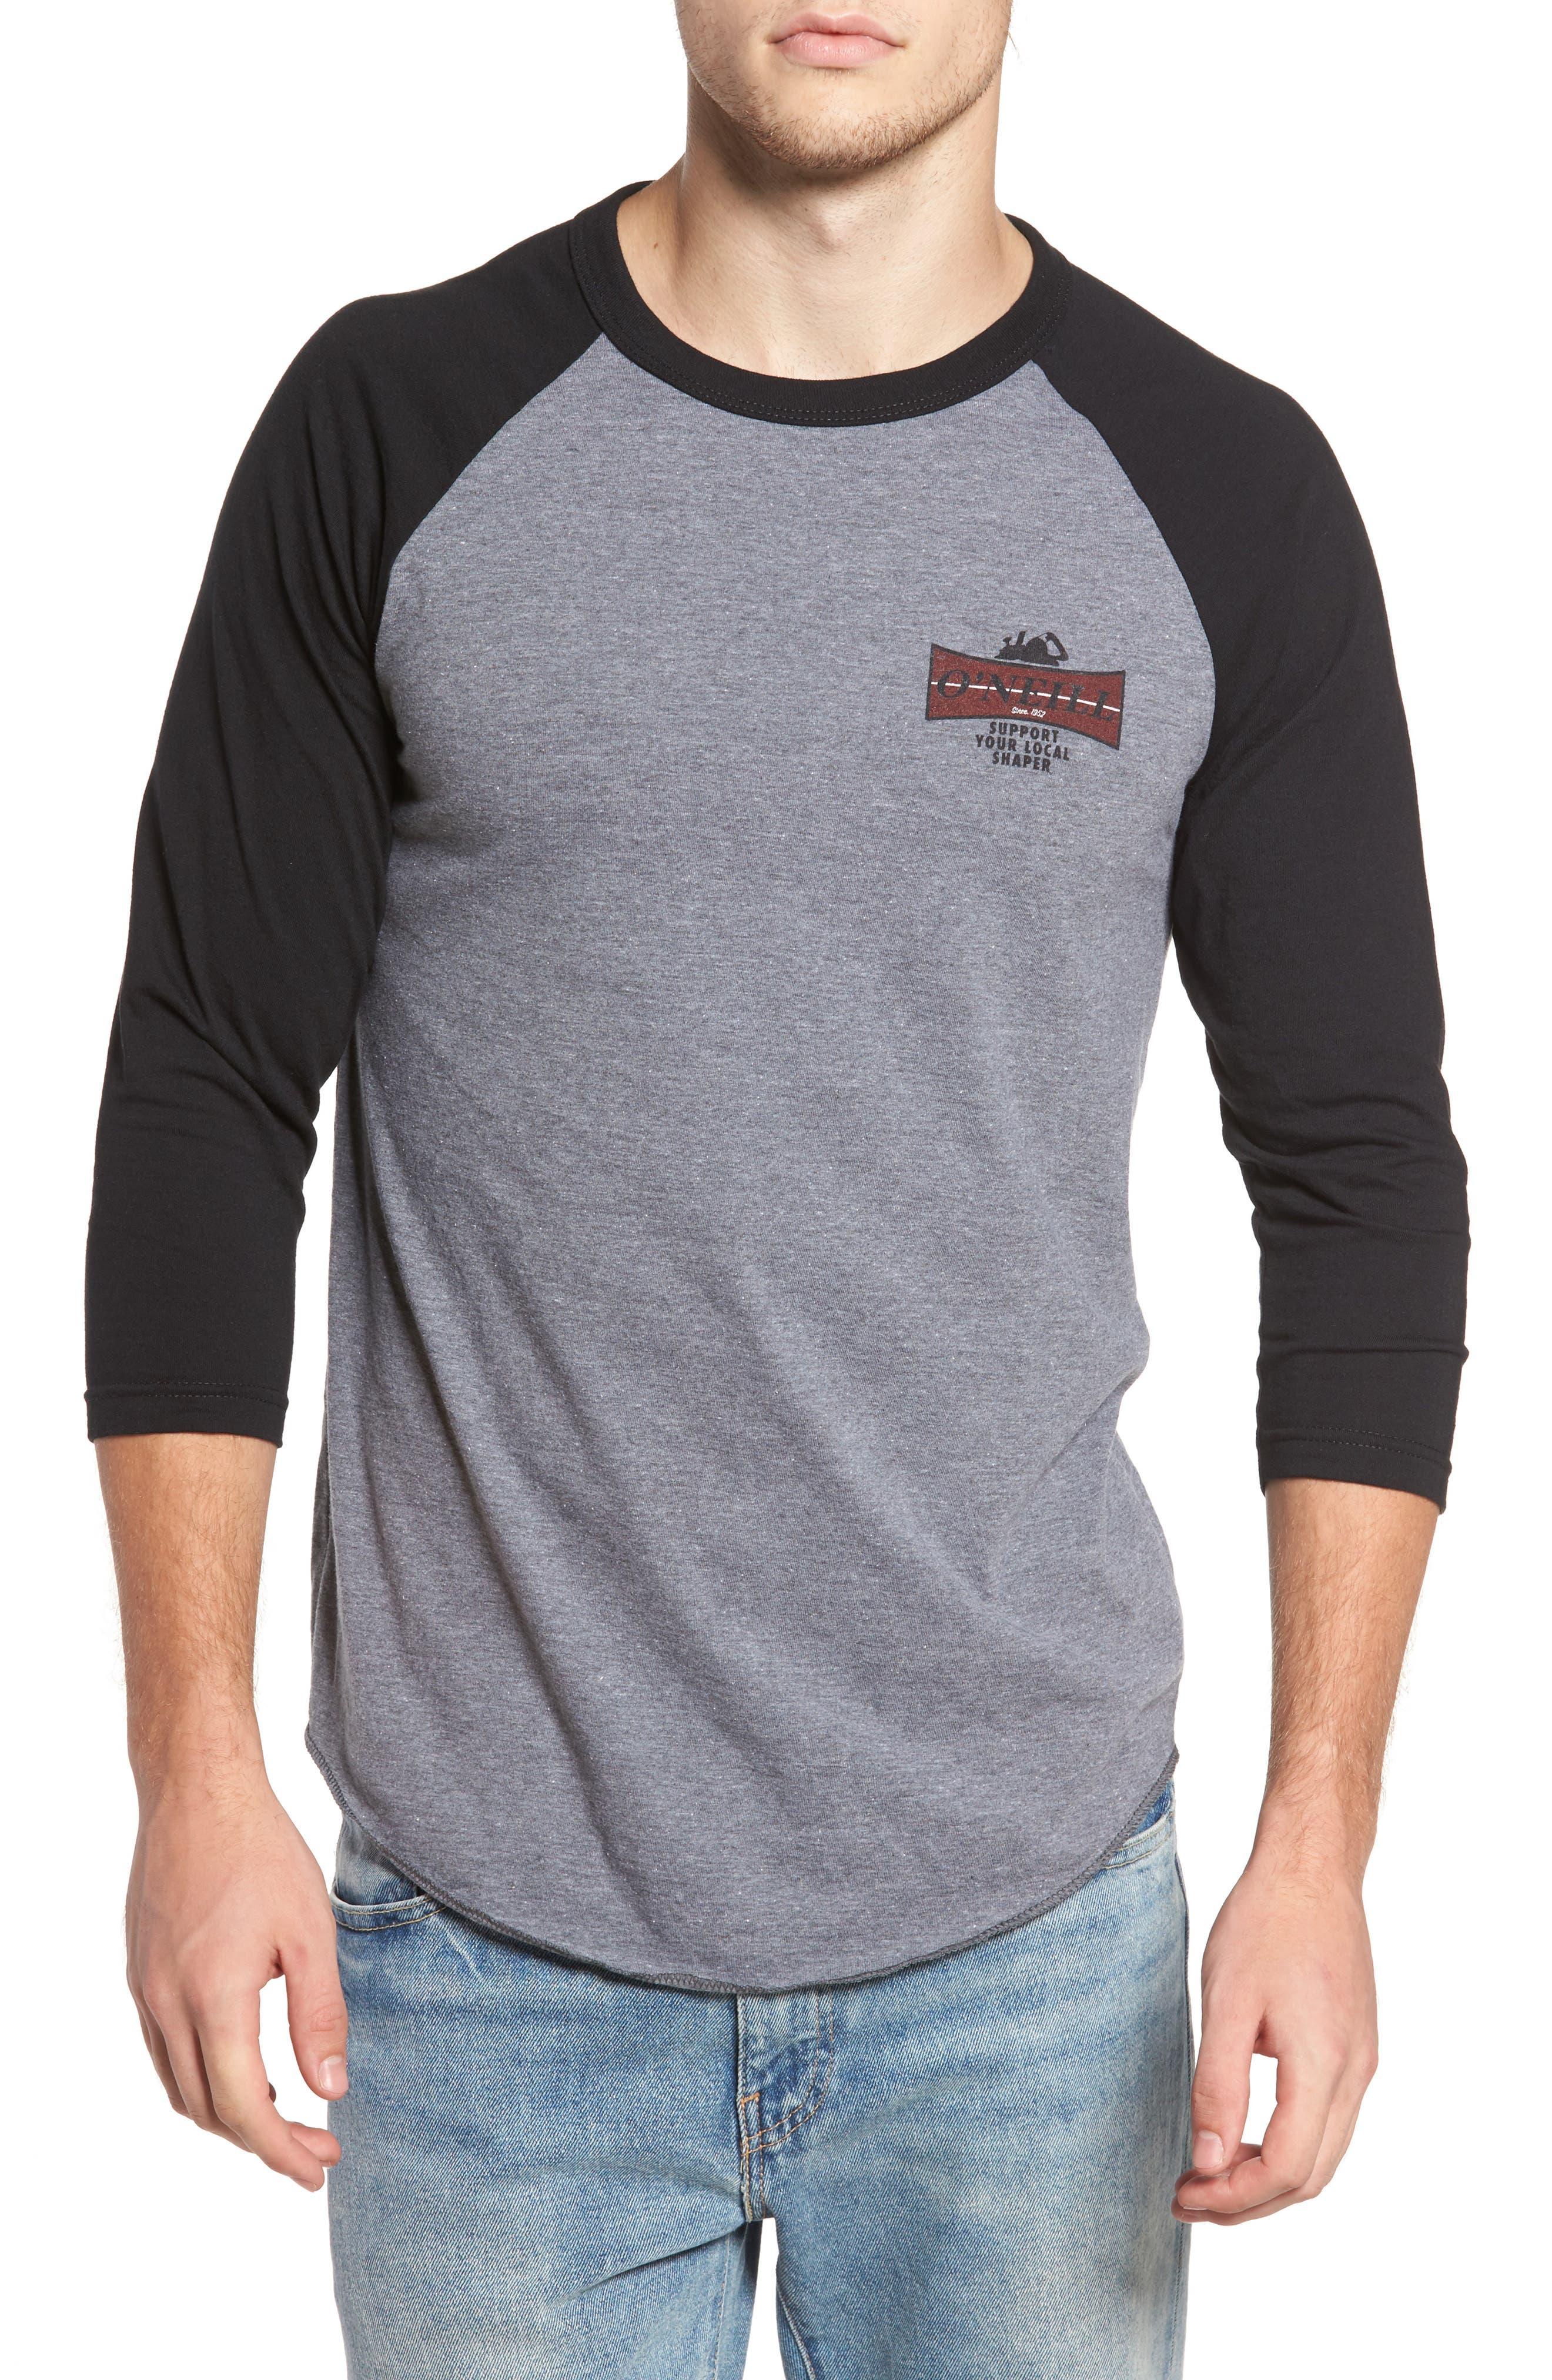 Planer Raglan T-Shirt,                             Main thumbnail 1, color,                             Grey W/ Black